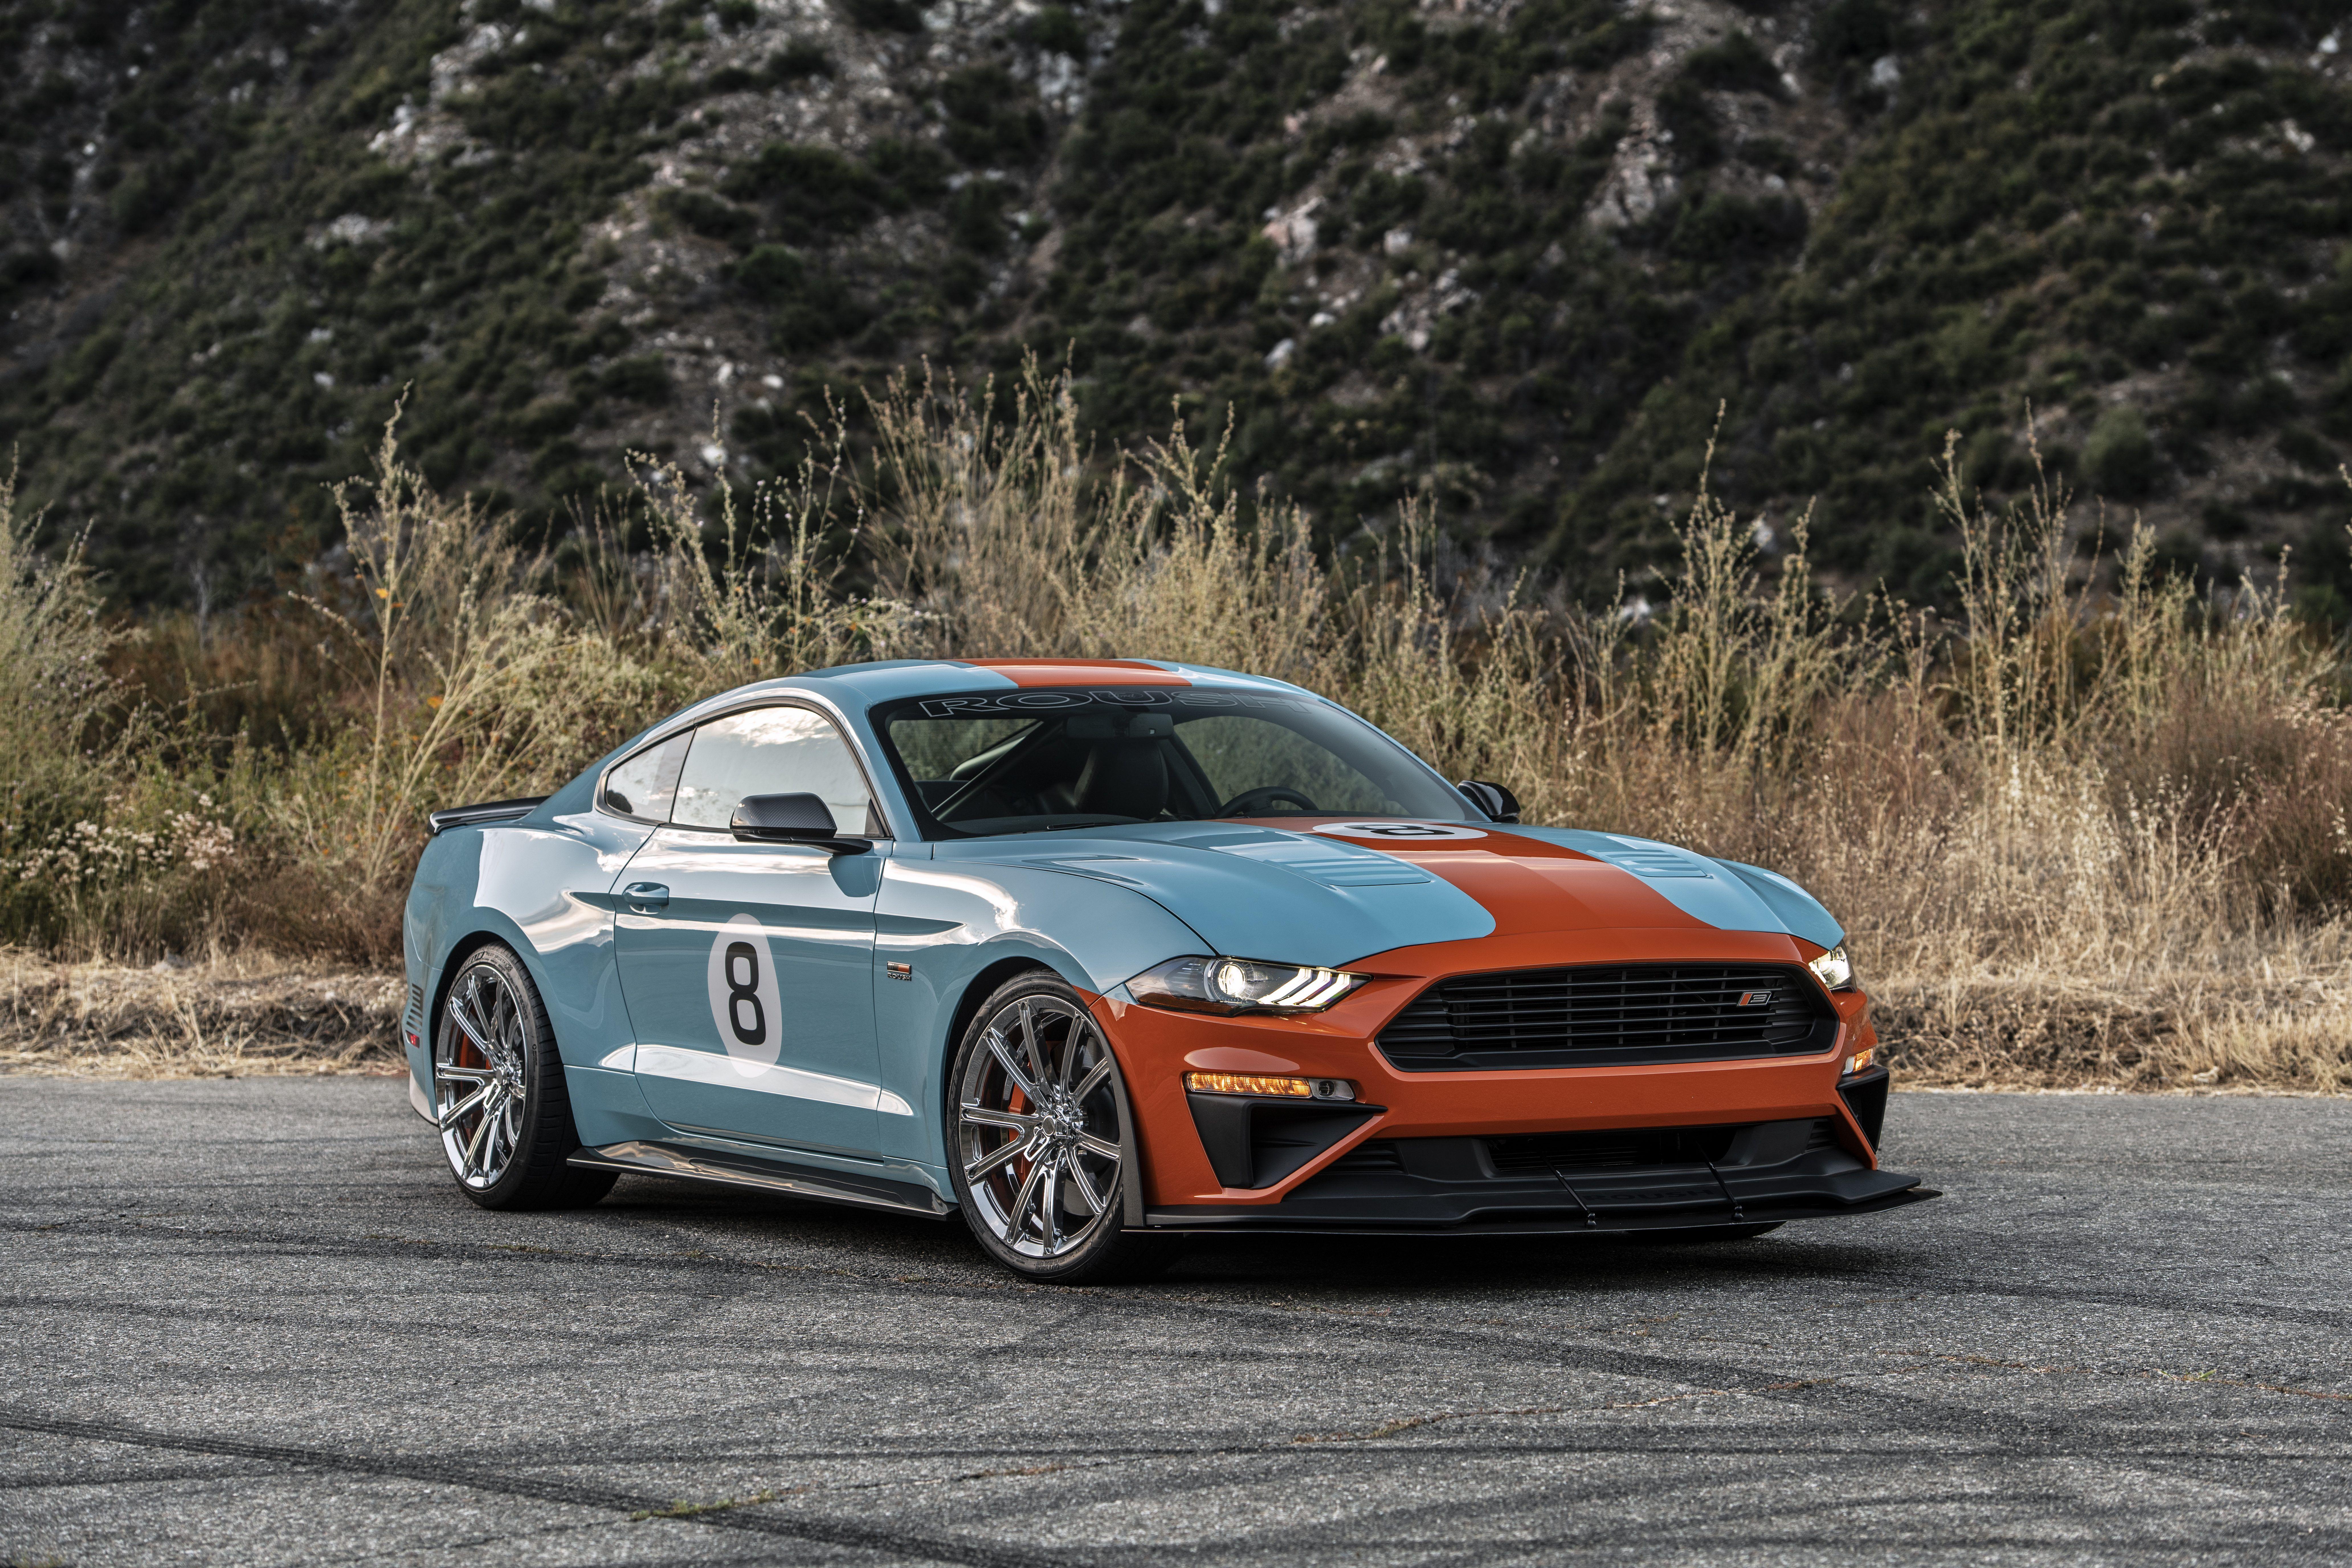 2019 Roush Stage 3 Roush Mustang Mustang Ford Mustang Roush